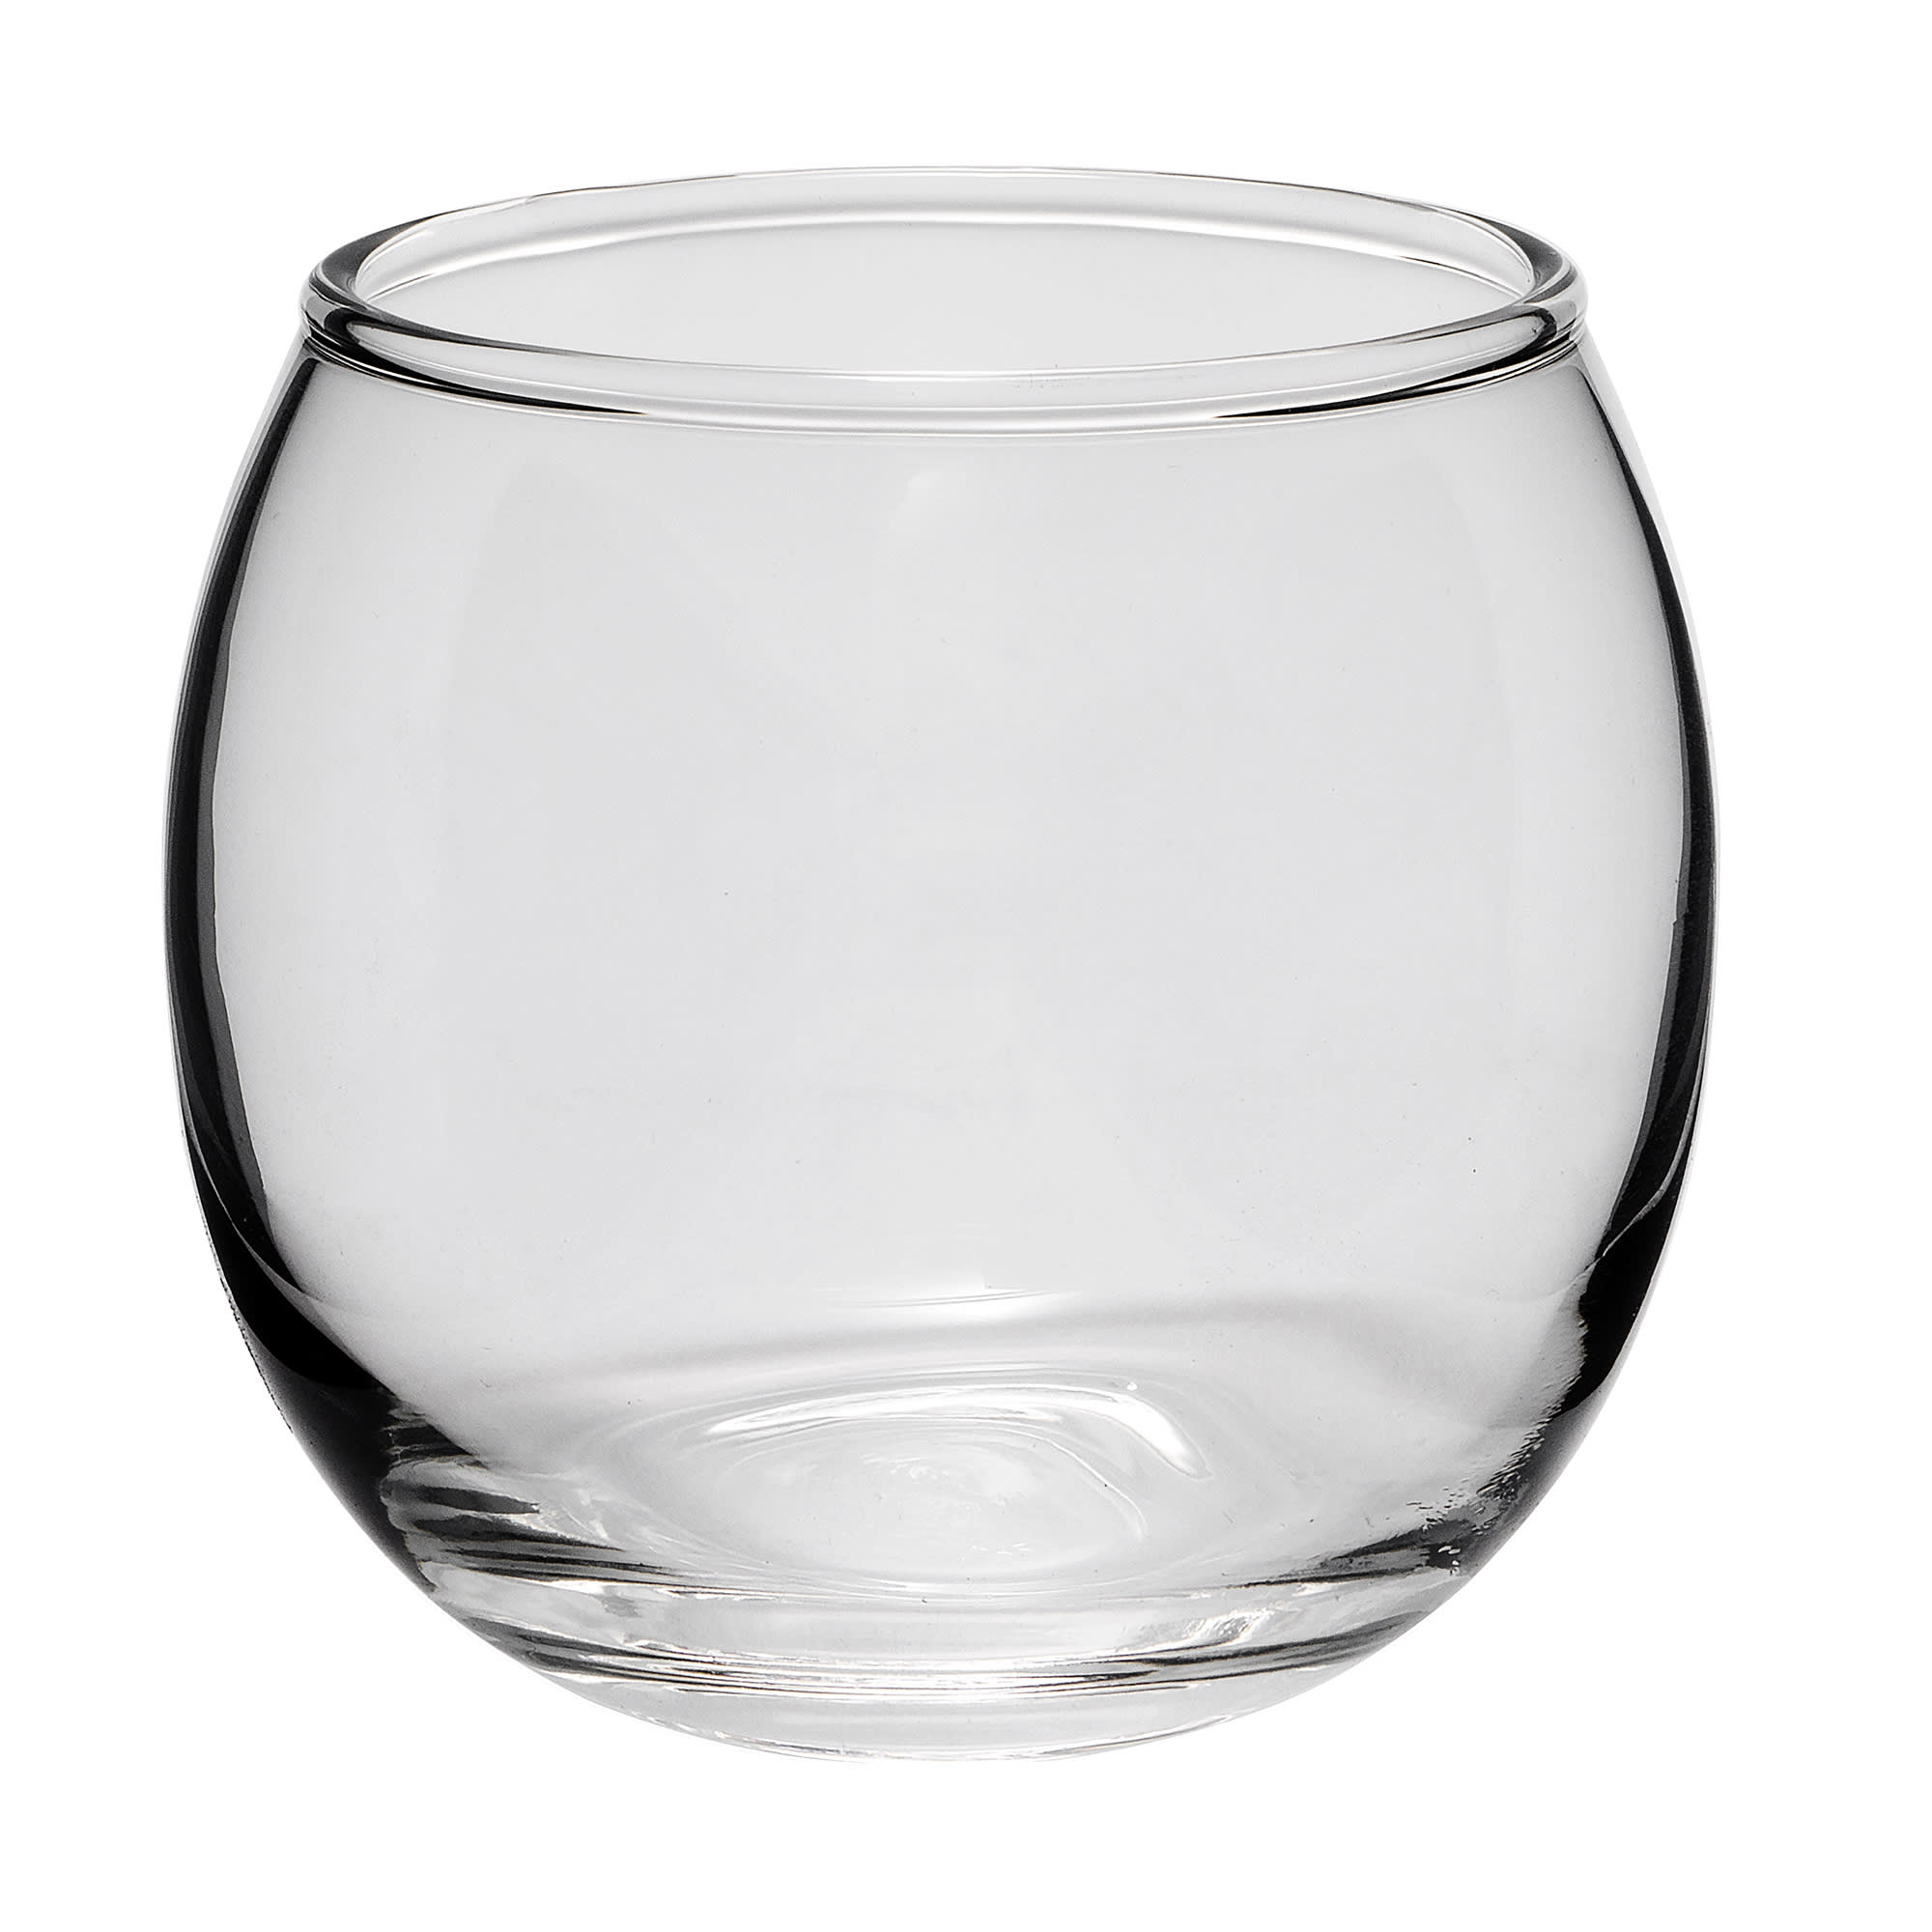 Libbey 1965 4.75-oz Finedge Glass Votive